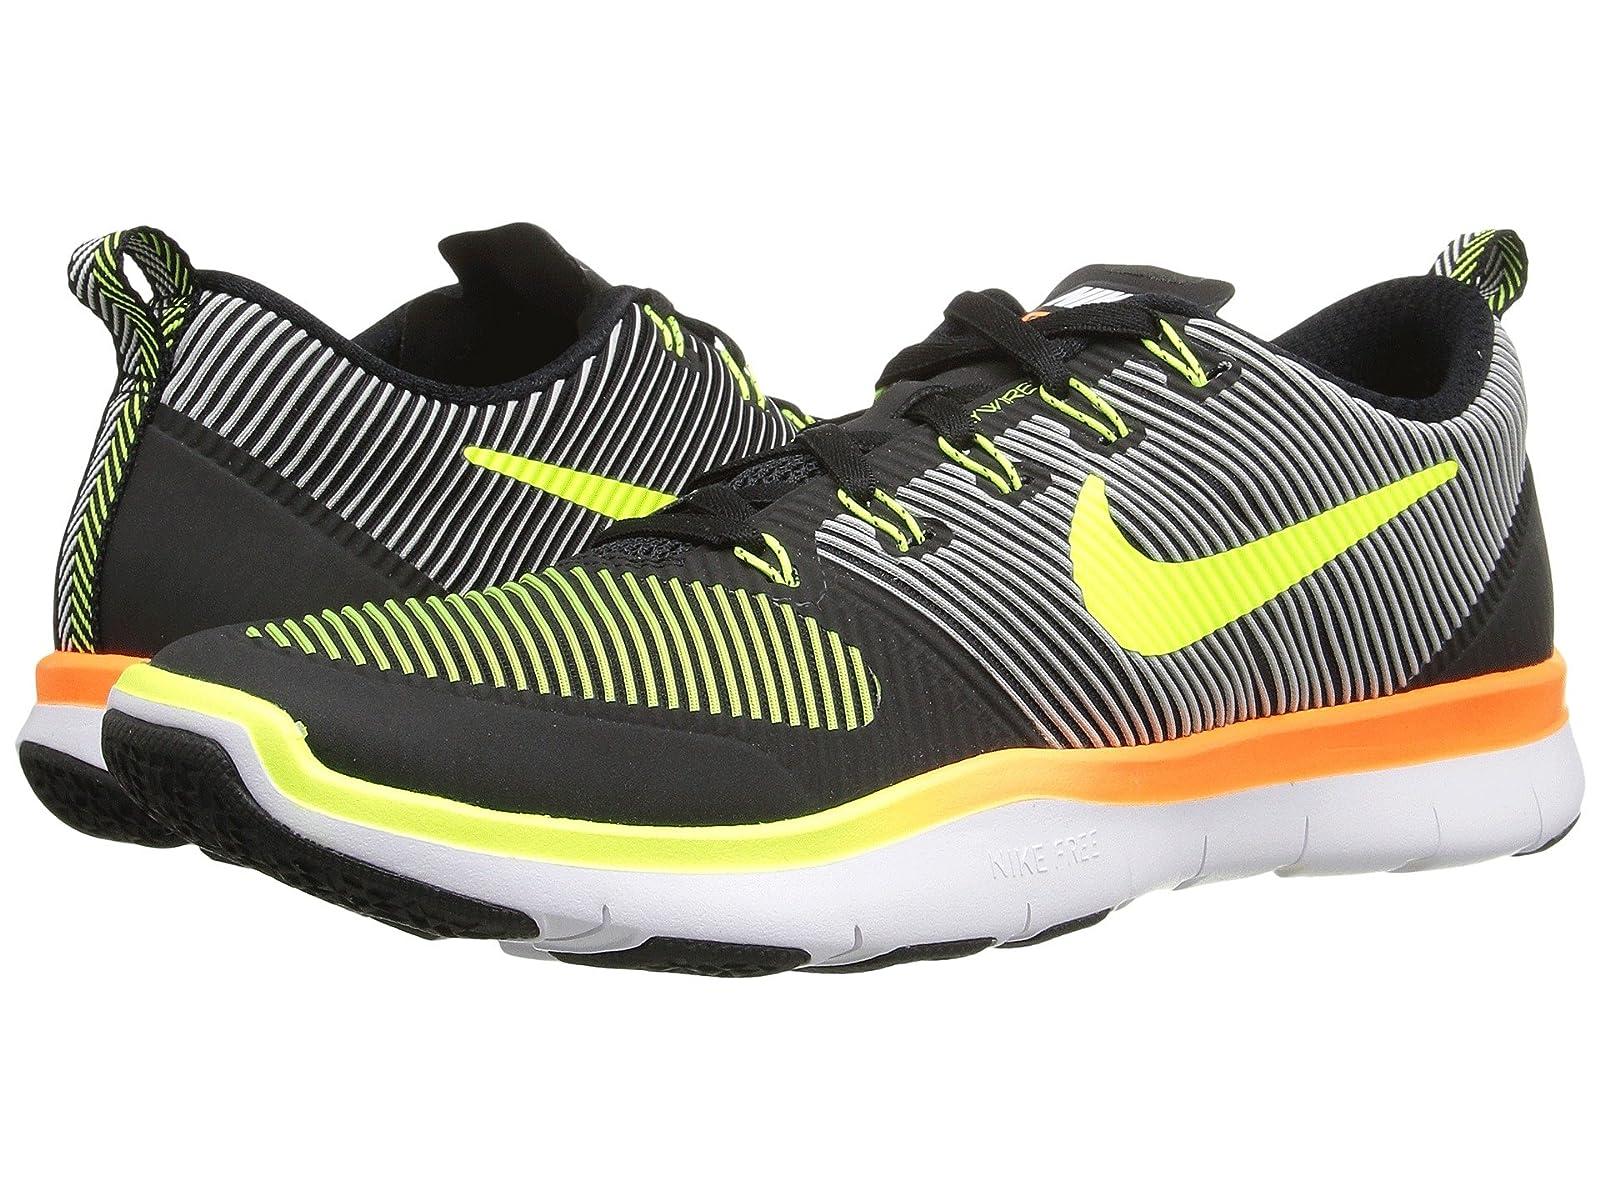 Nike Free Train VersatilityCheap and distinctive eye-catching shoes